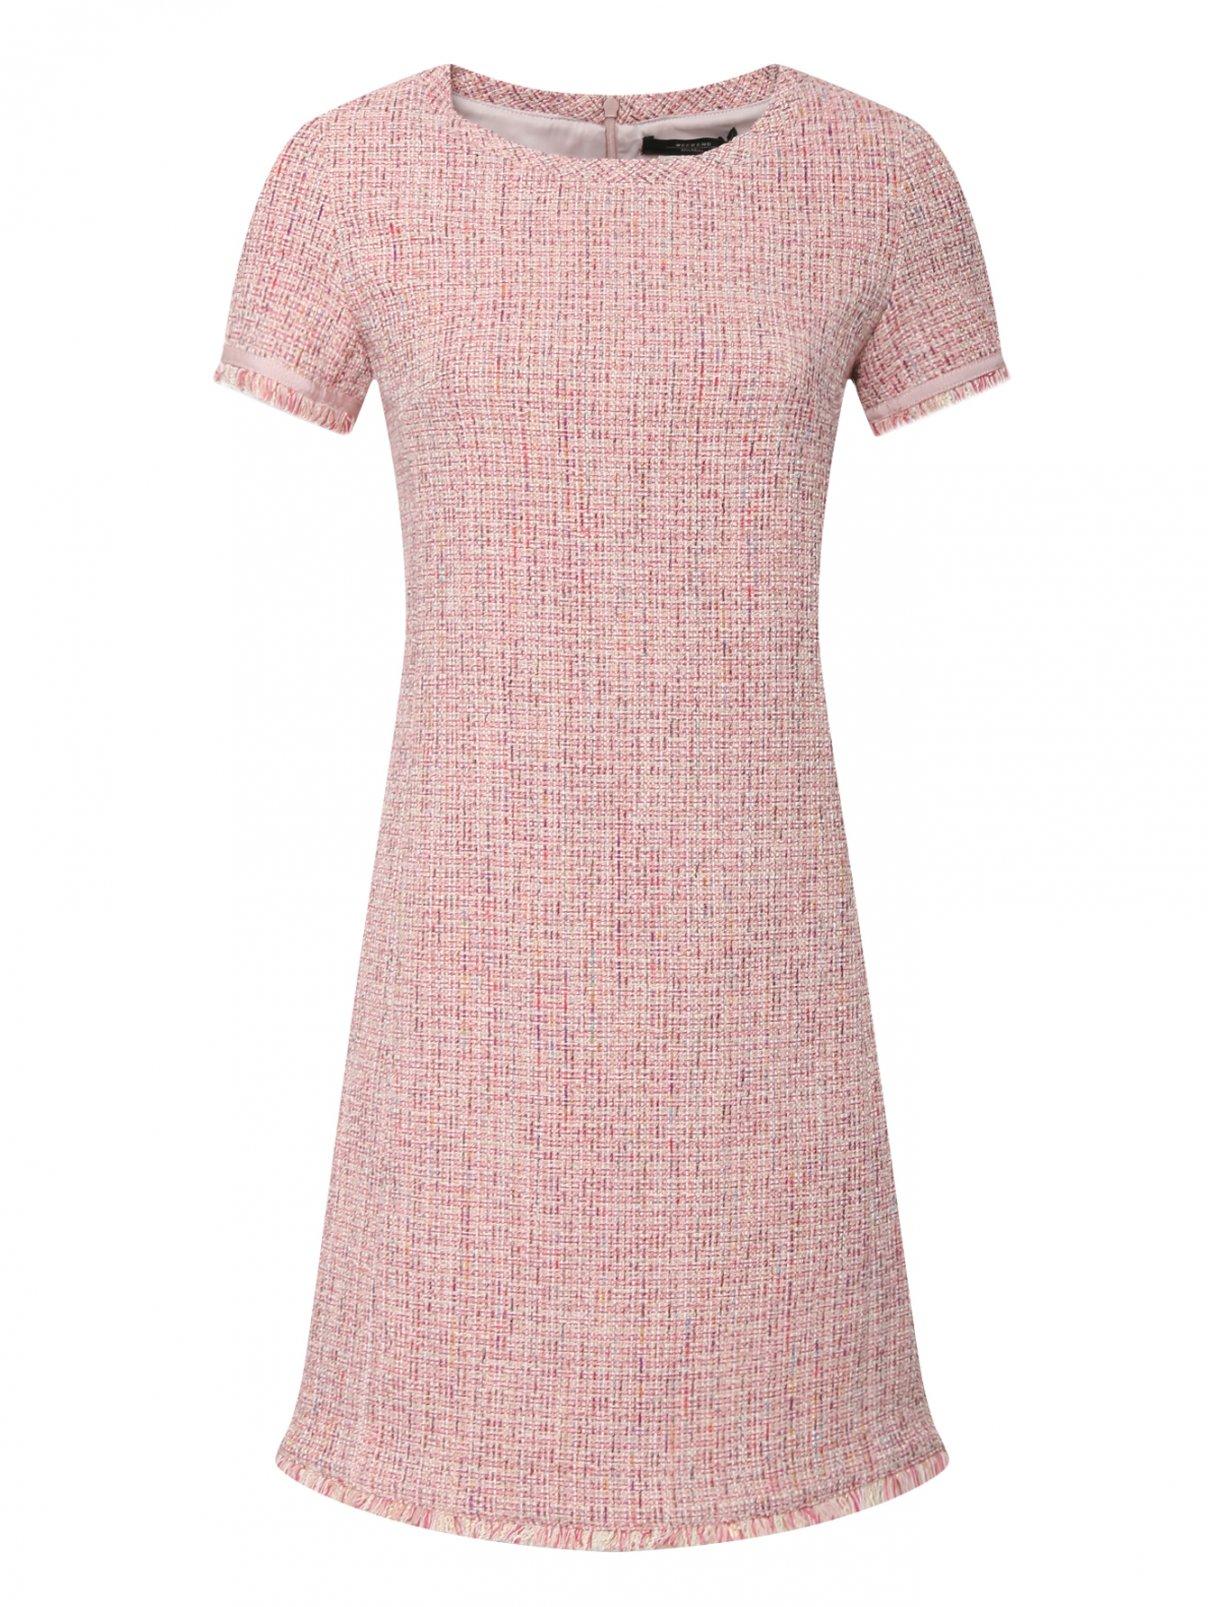 Платье-мини из хлопка с короткими рукавами Weekend Max Mara  –  Общий вид